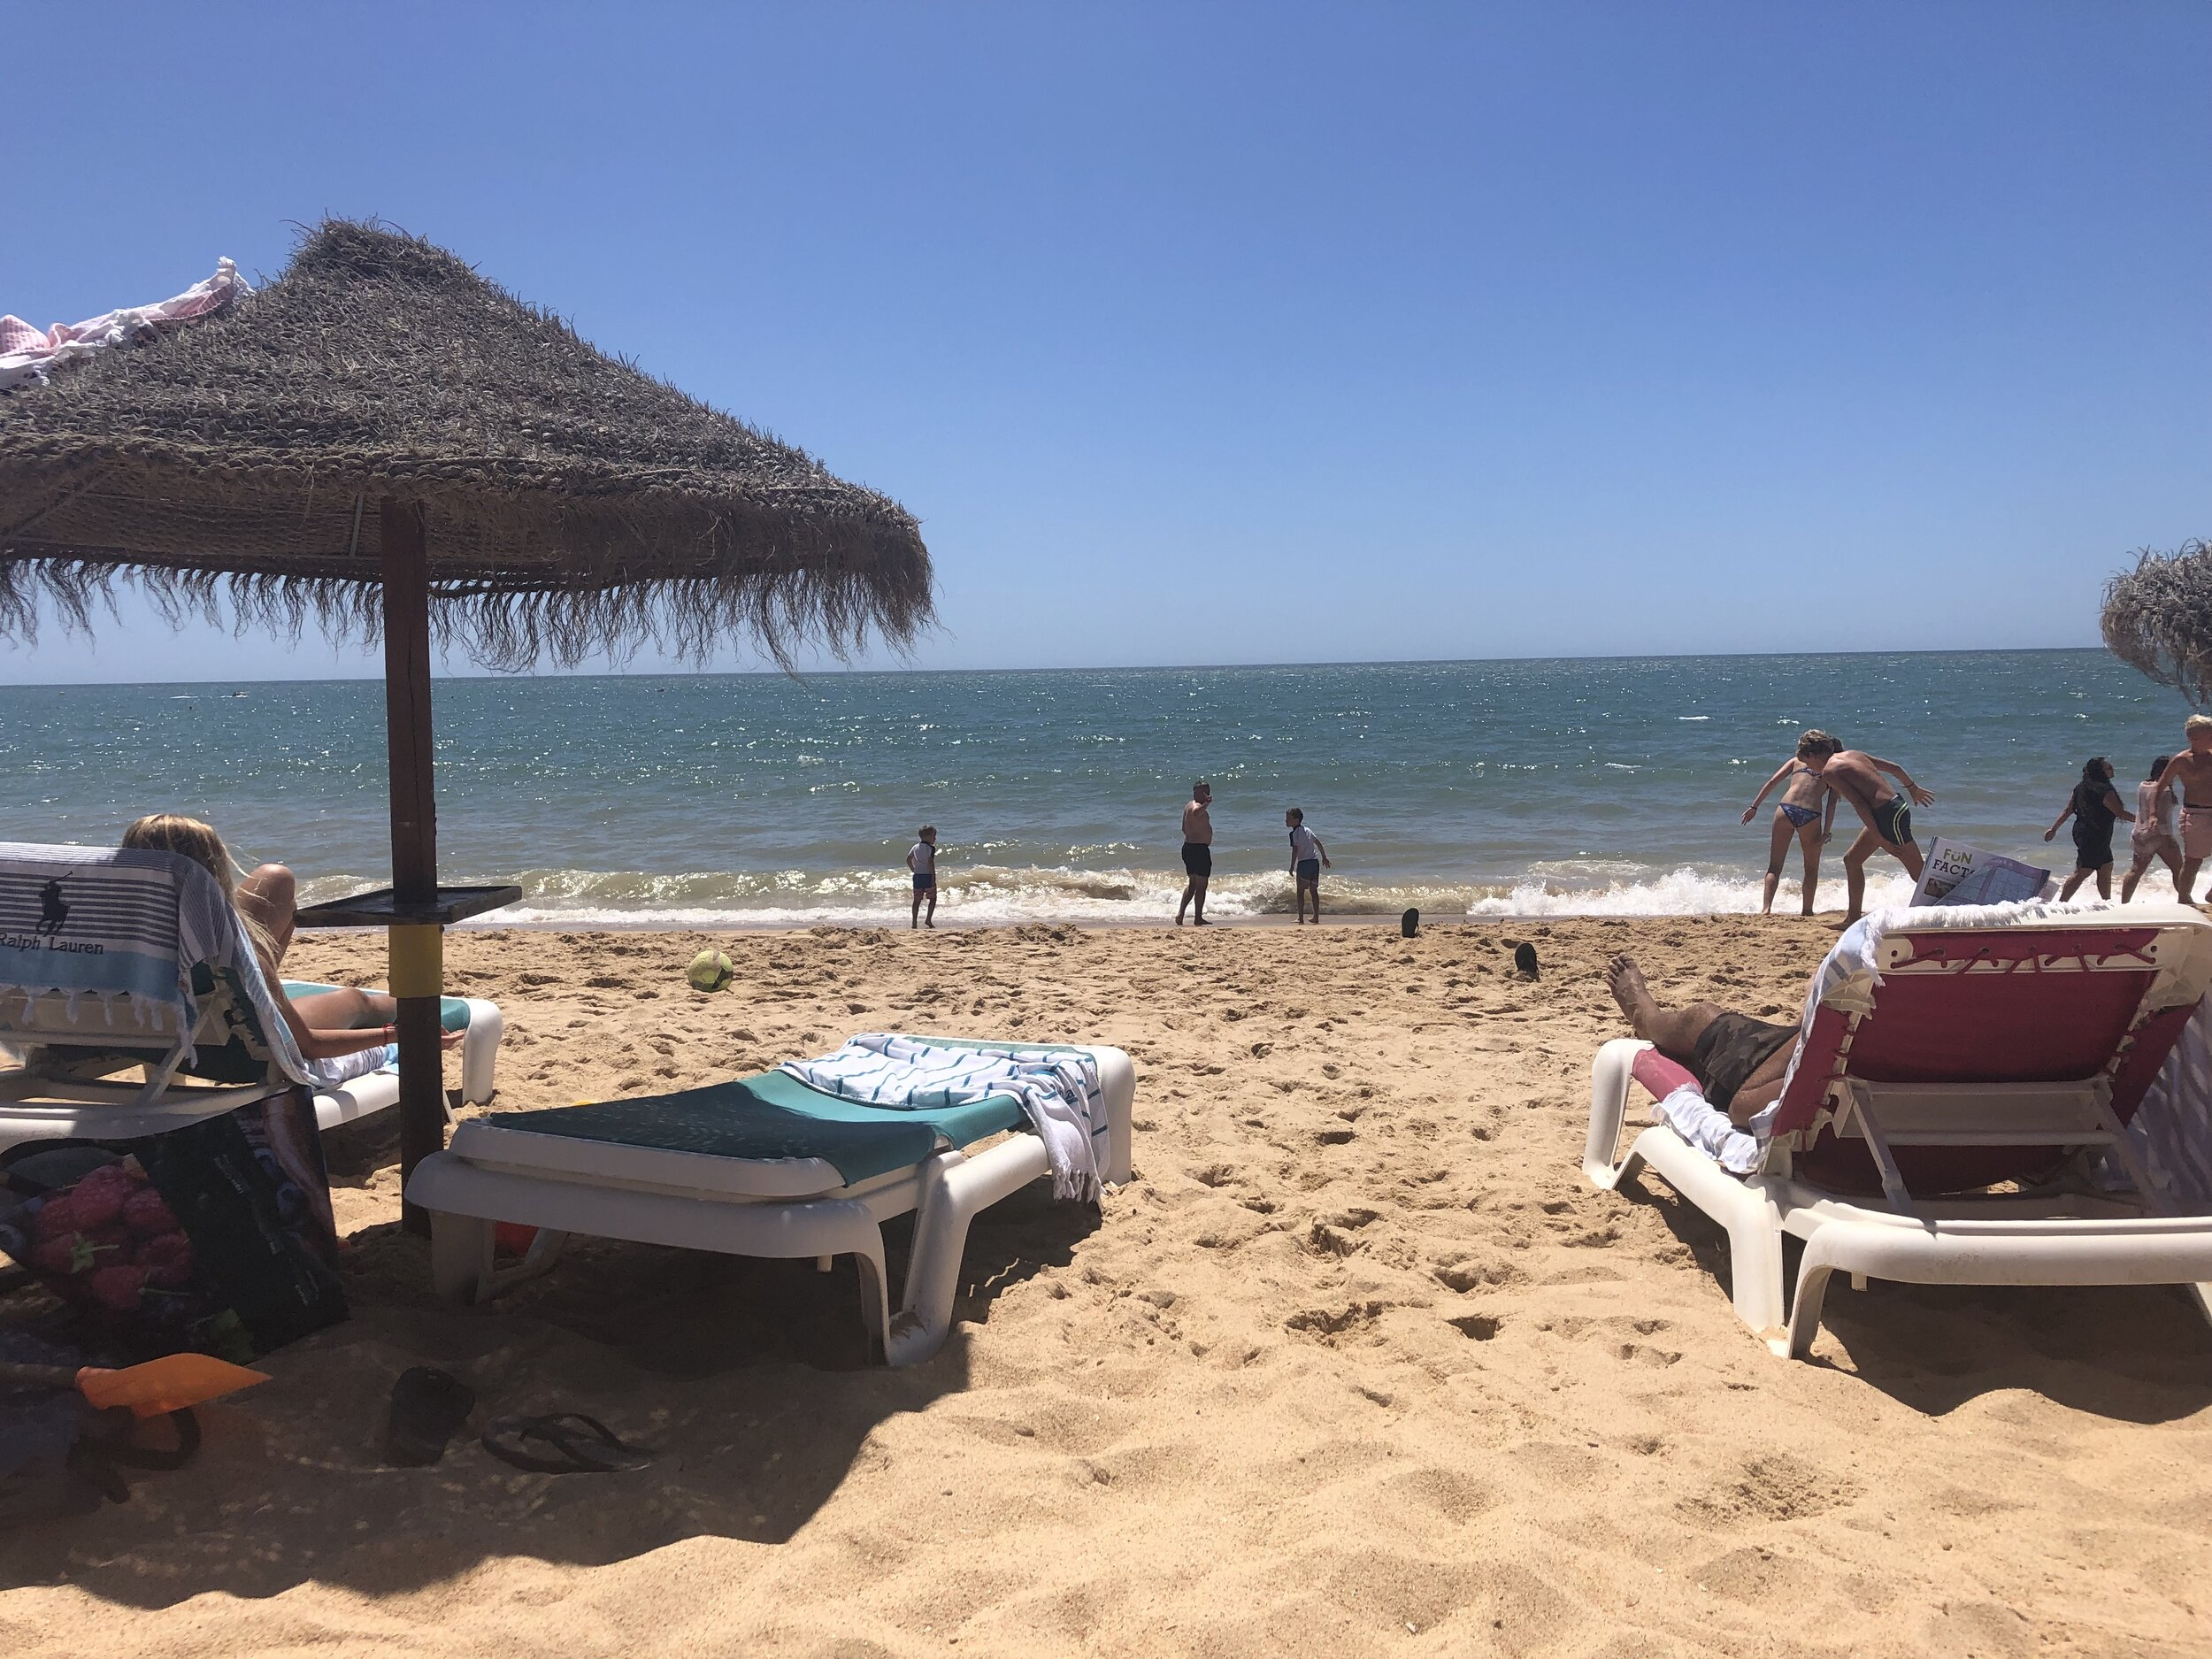 BJs beach …